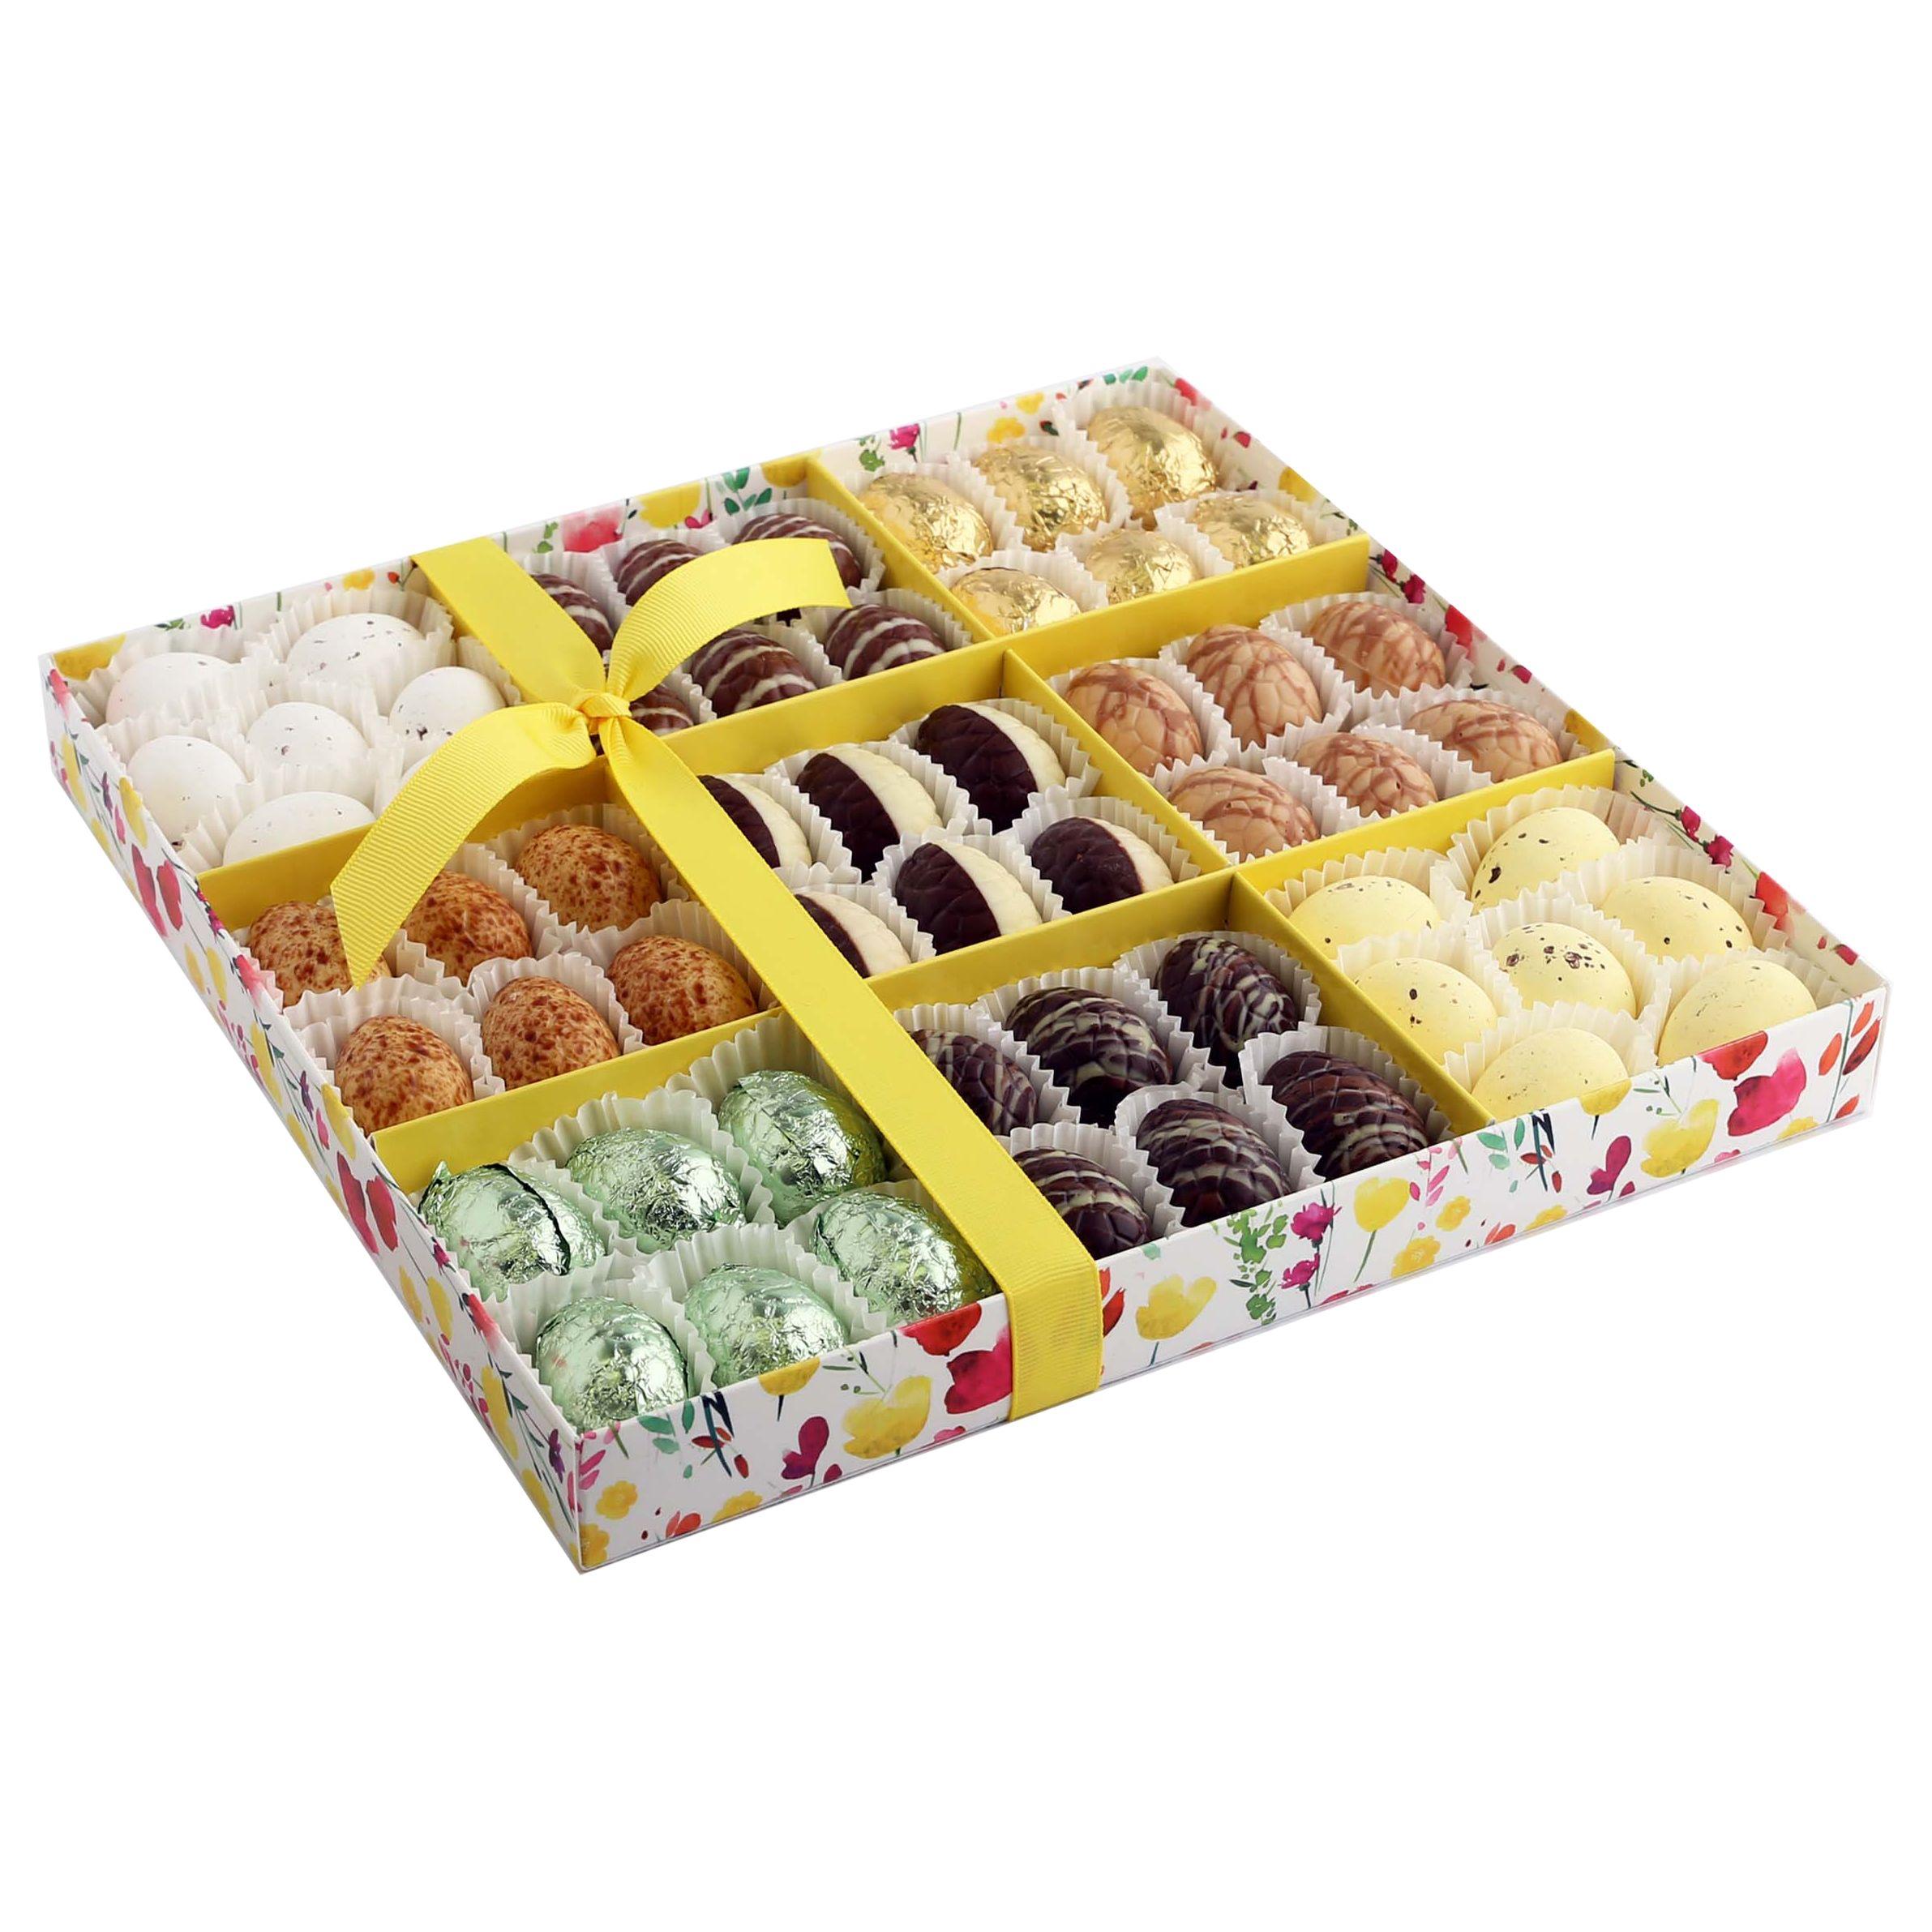 Unbranded Milk Chocolate & Praline Filled Eggs, Box of 9, 680g